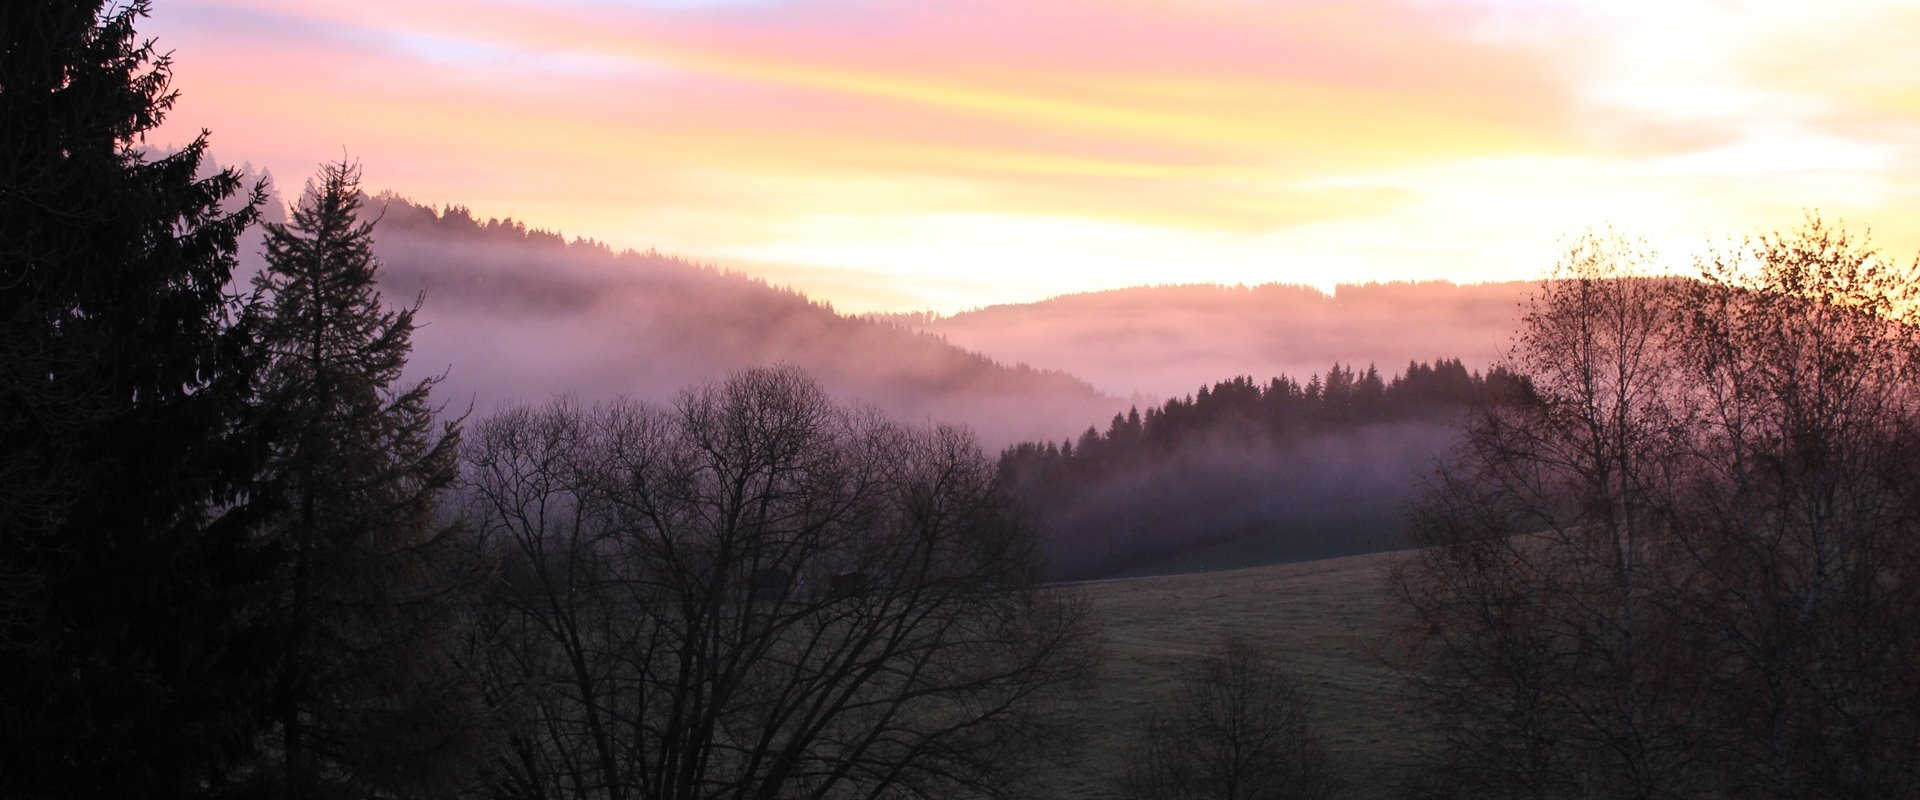 Sonnenaufgang mit Morgenrot im Jostal / Griesbachhof-Schwarzwald